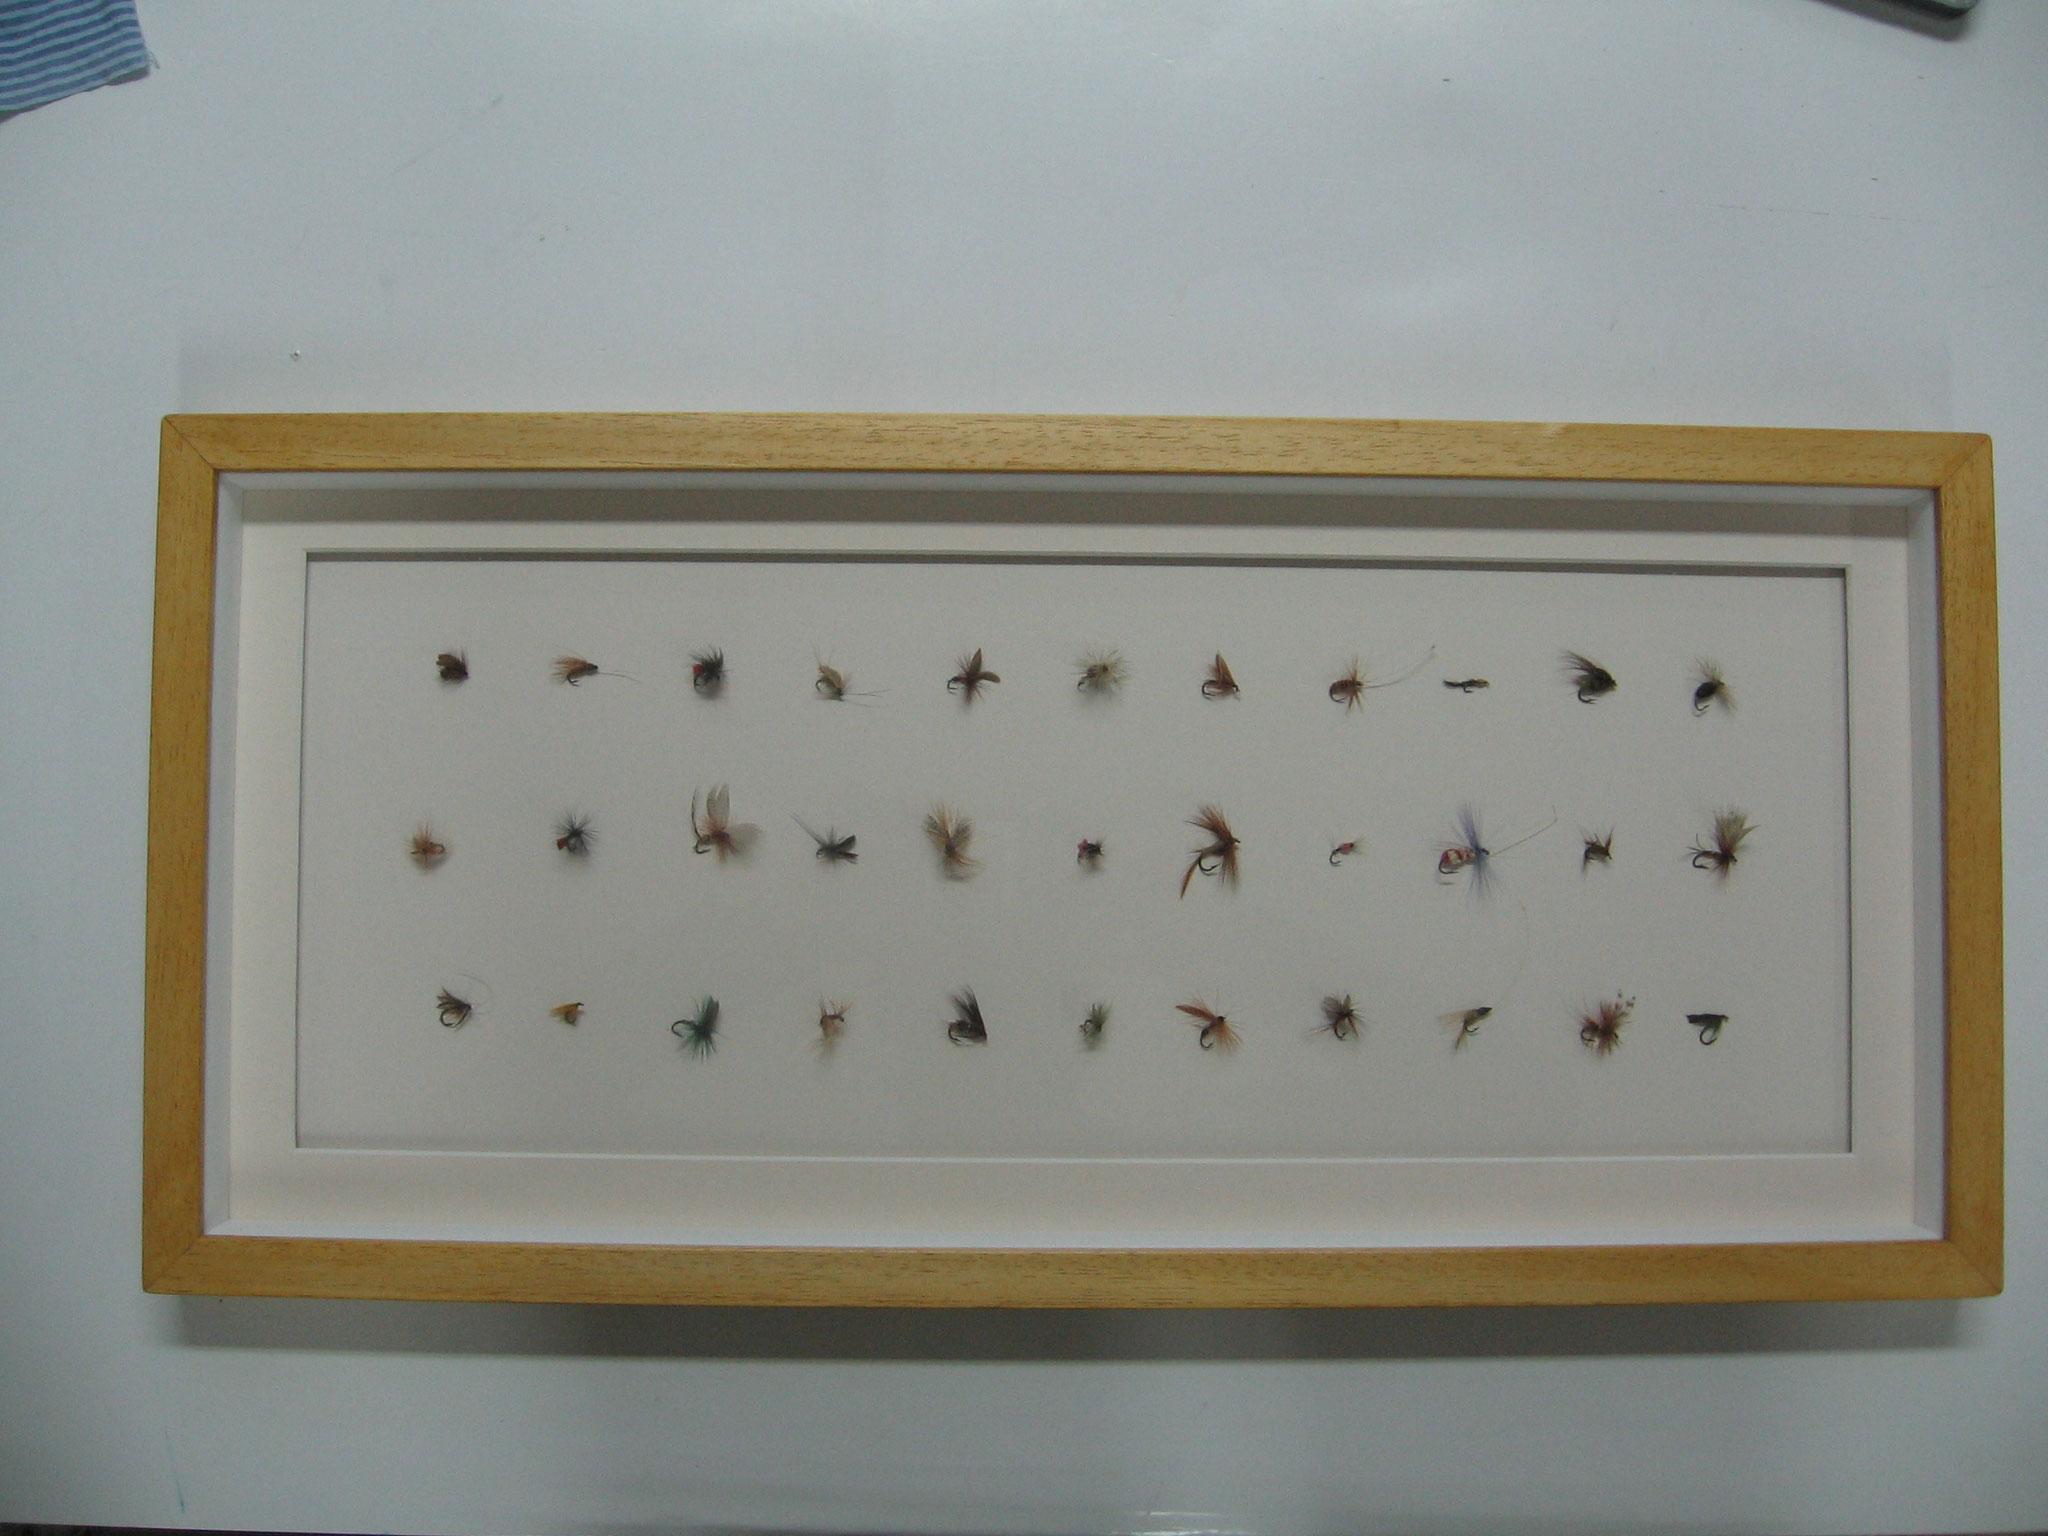 Collezione di mosche da pesca.